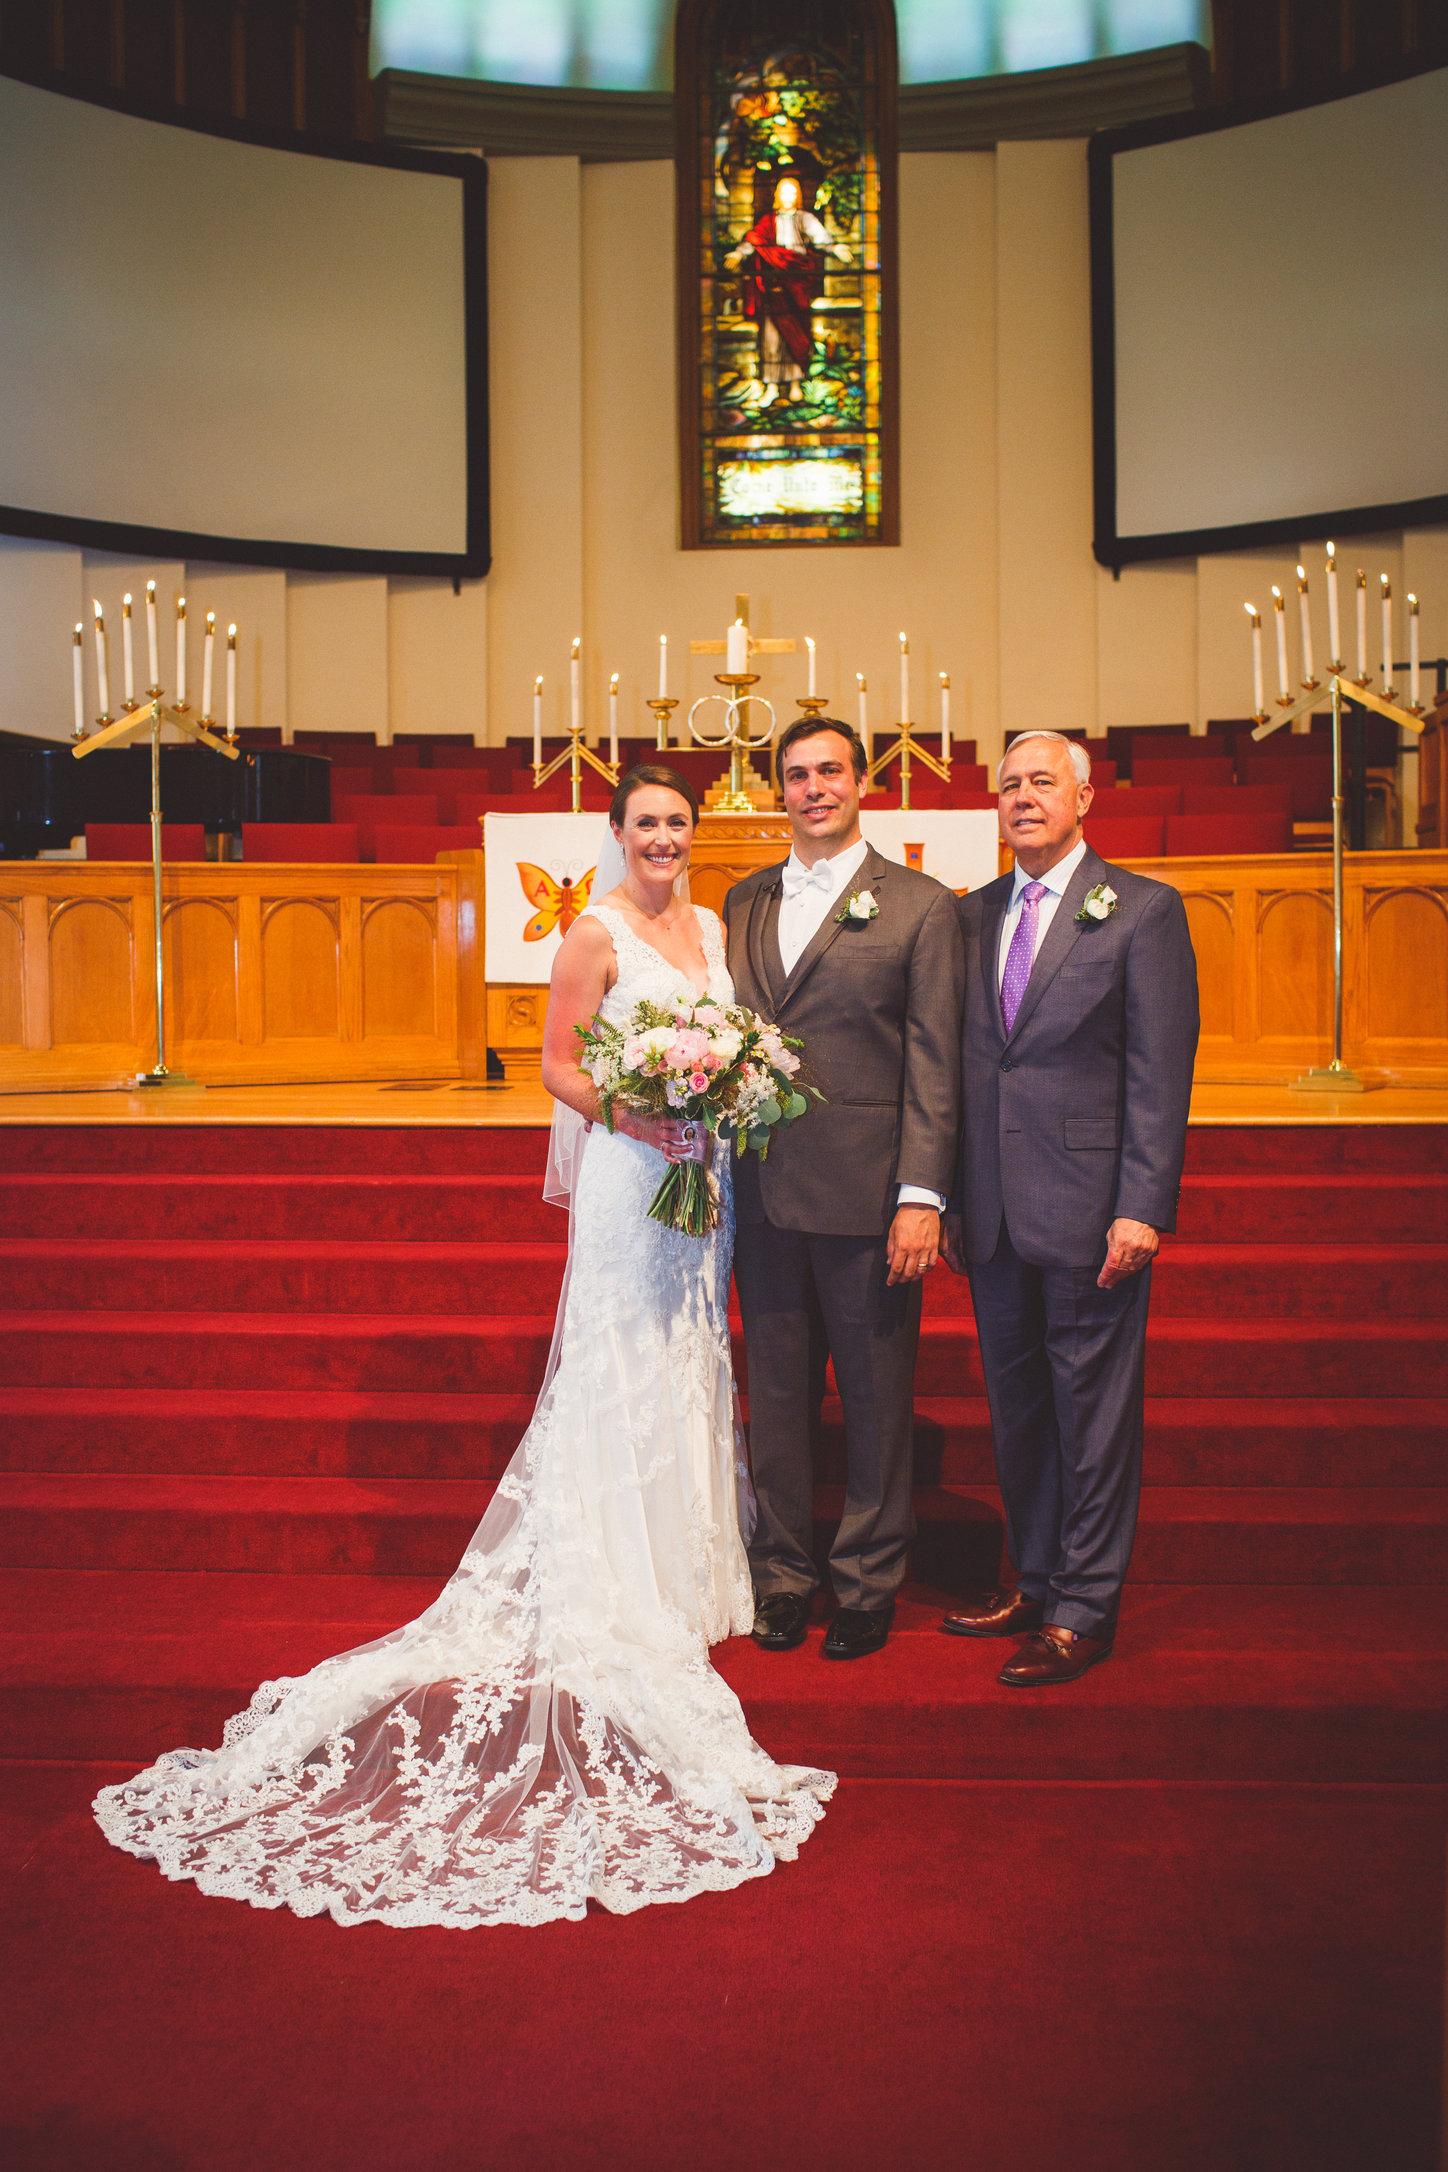 SandC-wedding-259.jpg